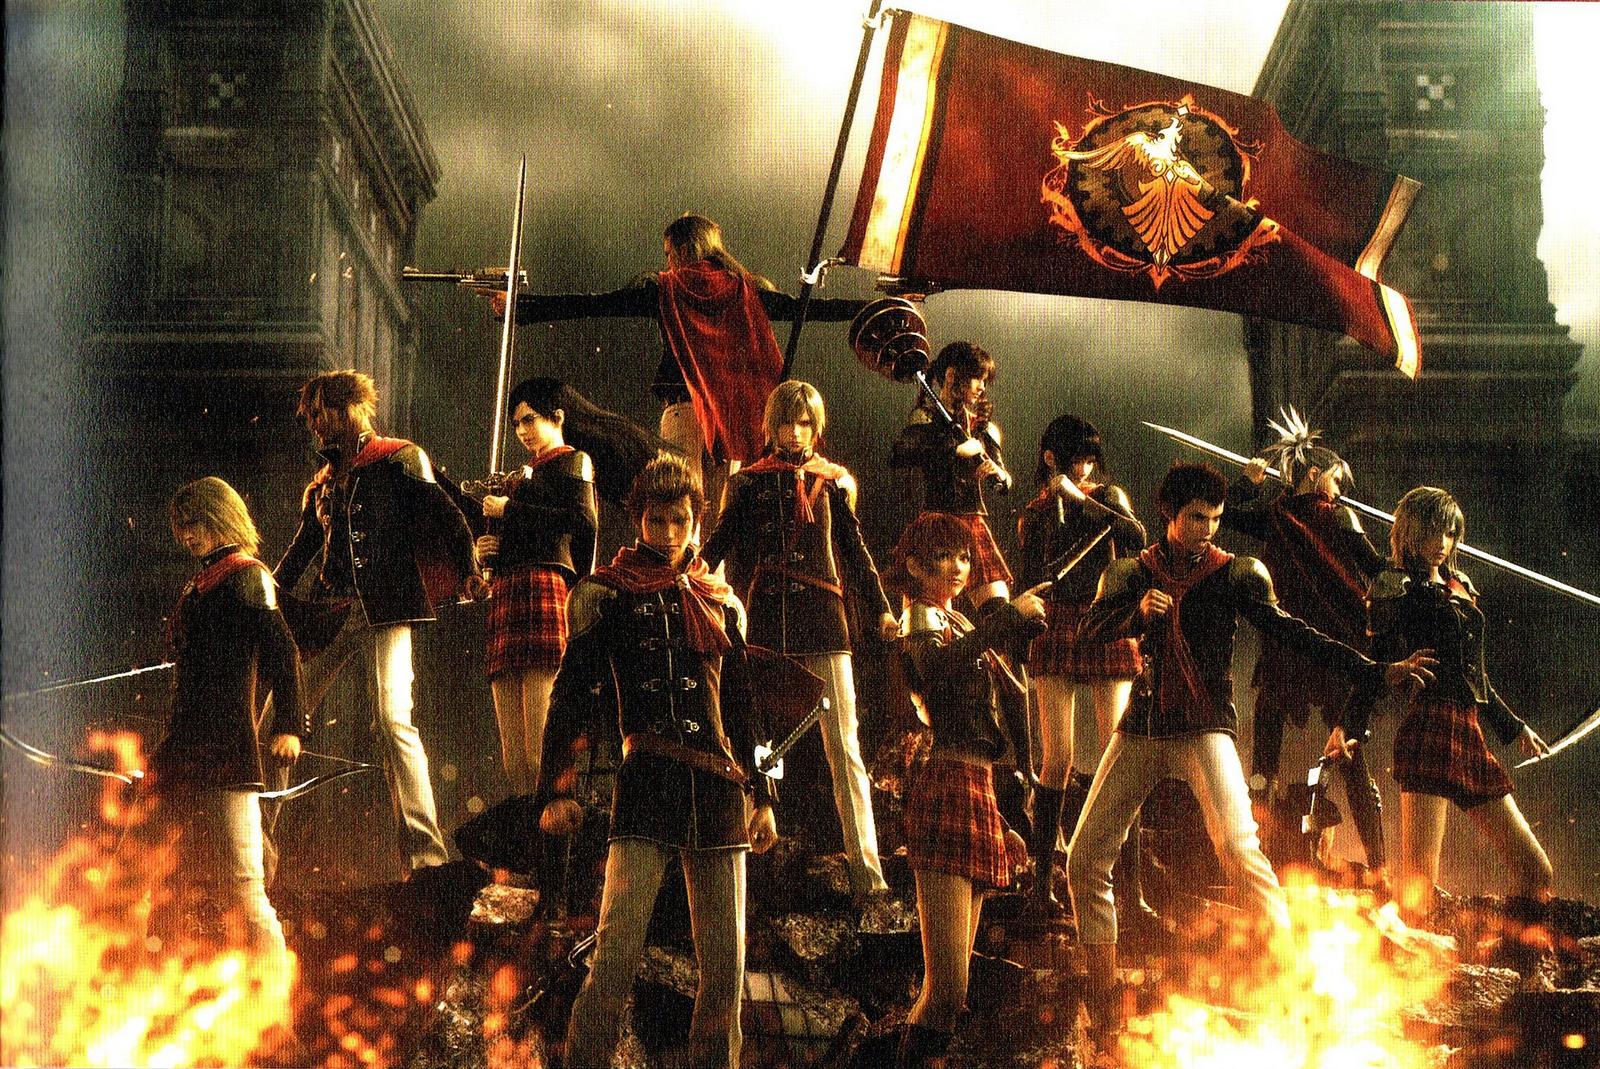 Final Fantasy Type 0 Hd Games 4k Wallpapers Images: Final Fantasy Type-0 HD (PS4) Review